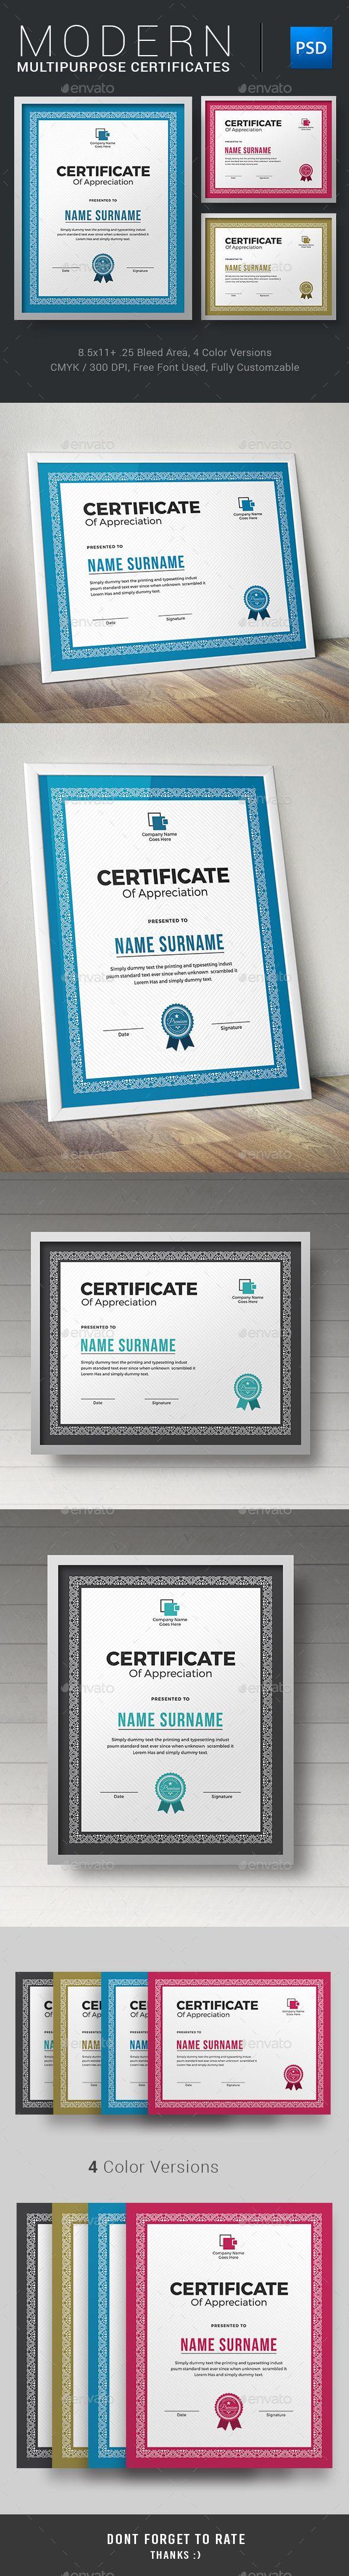 Certificate Template PSD